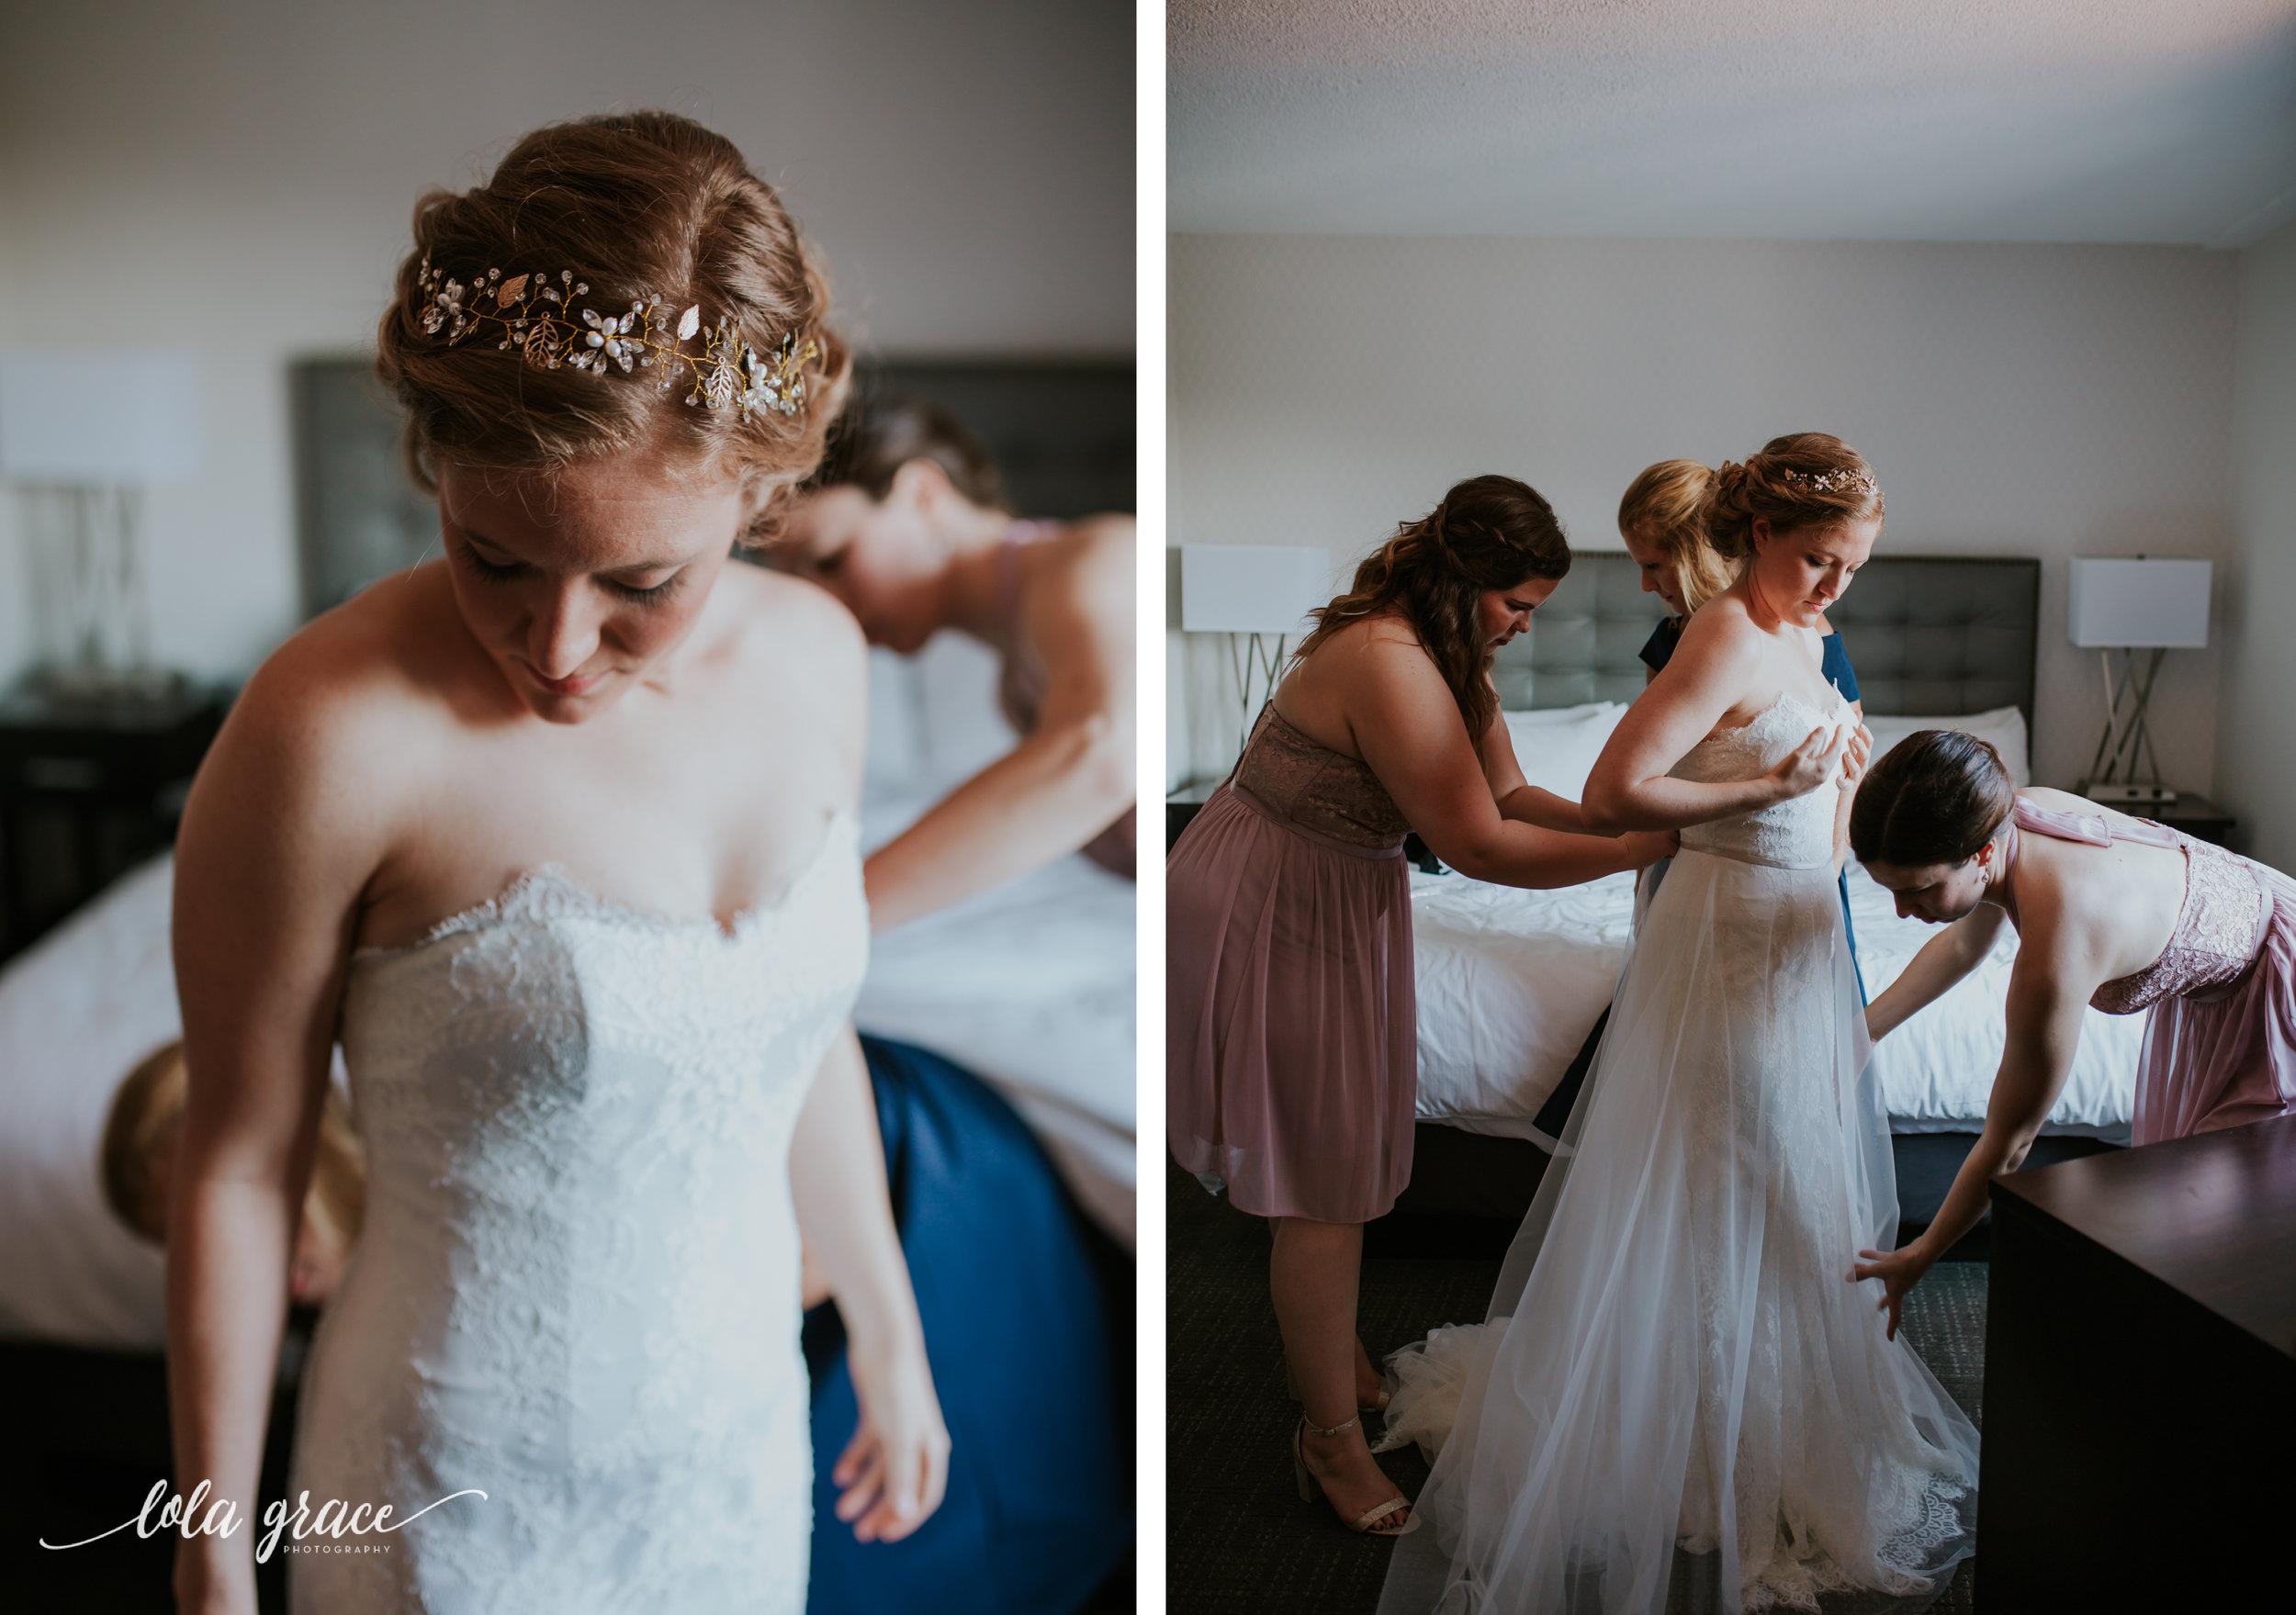 lolagracephotography-fall-ann-arbor-wedding-botanical-gardens-12.jpg